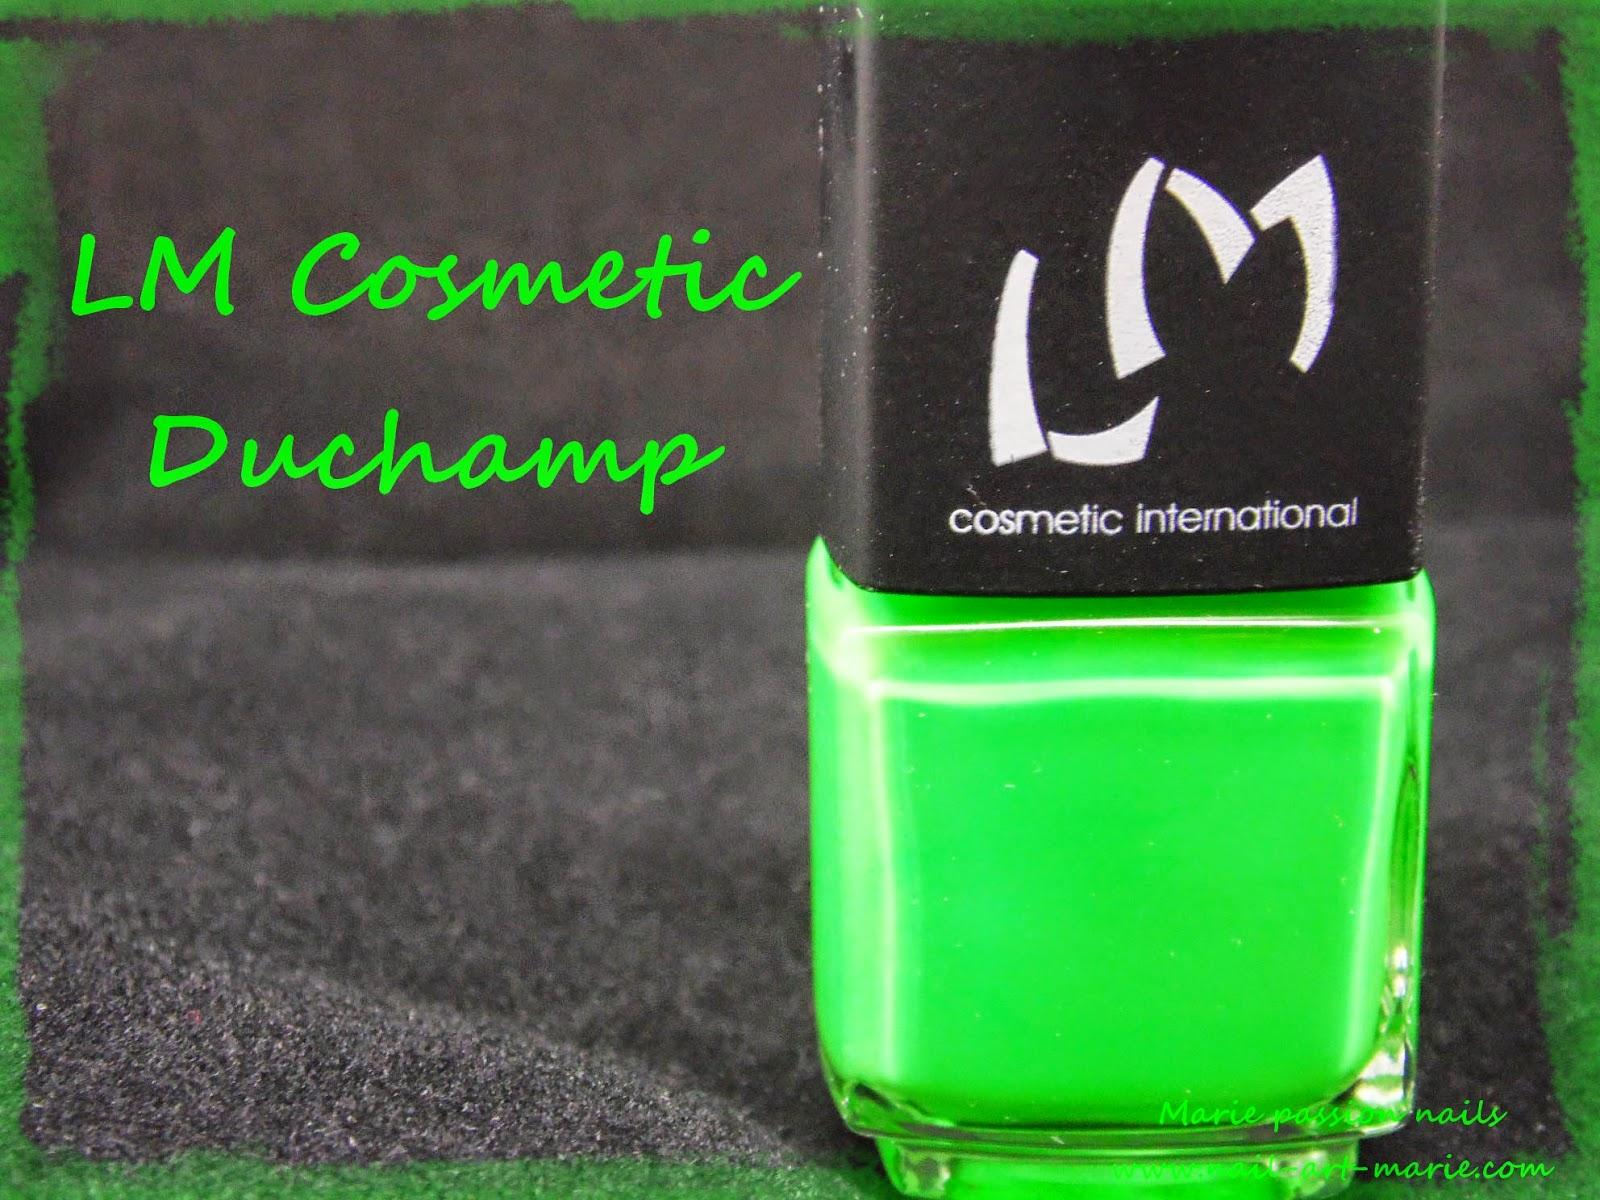 LM Cosmetic Duchamp1